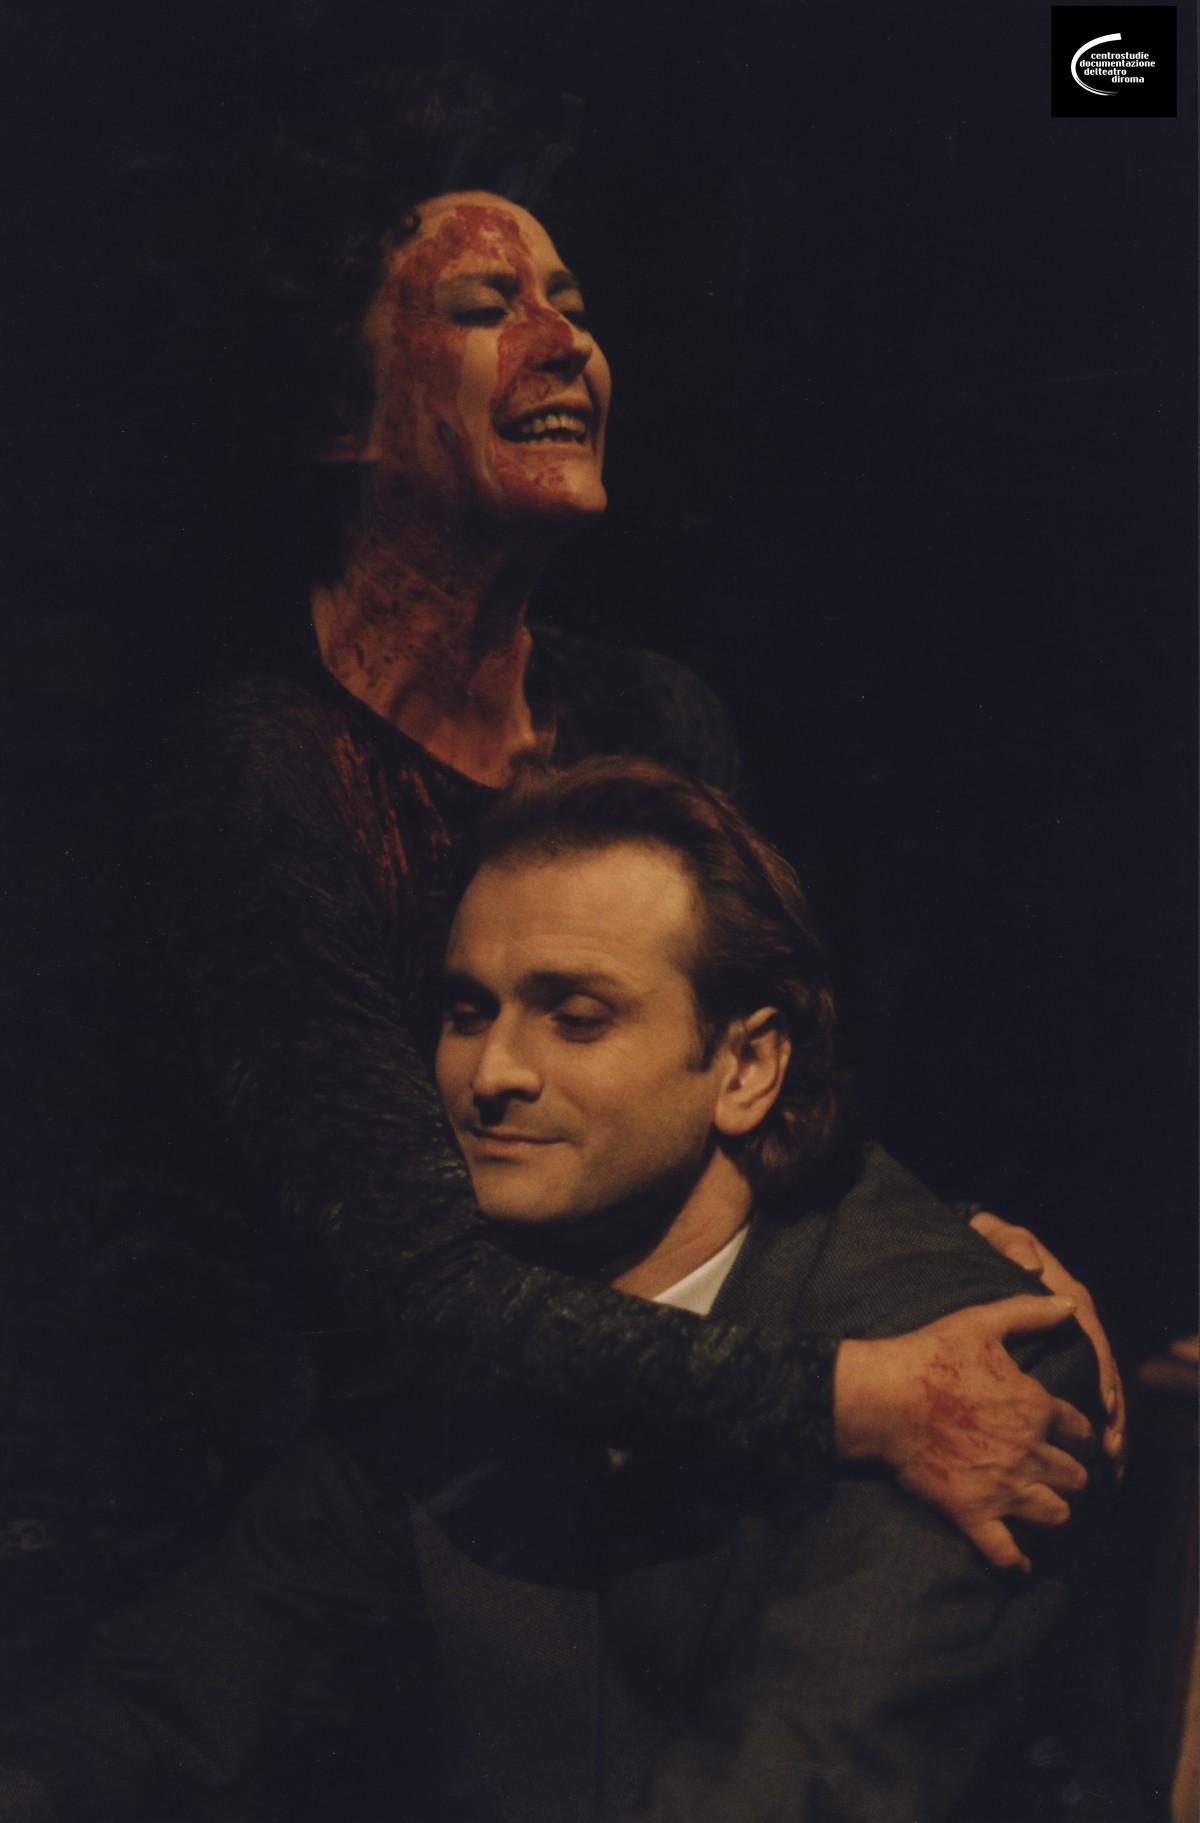 Quer pasticciaccio brutto de via Merulana (1996)